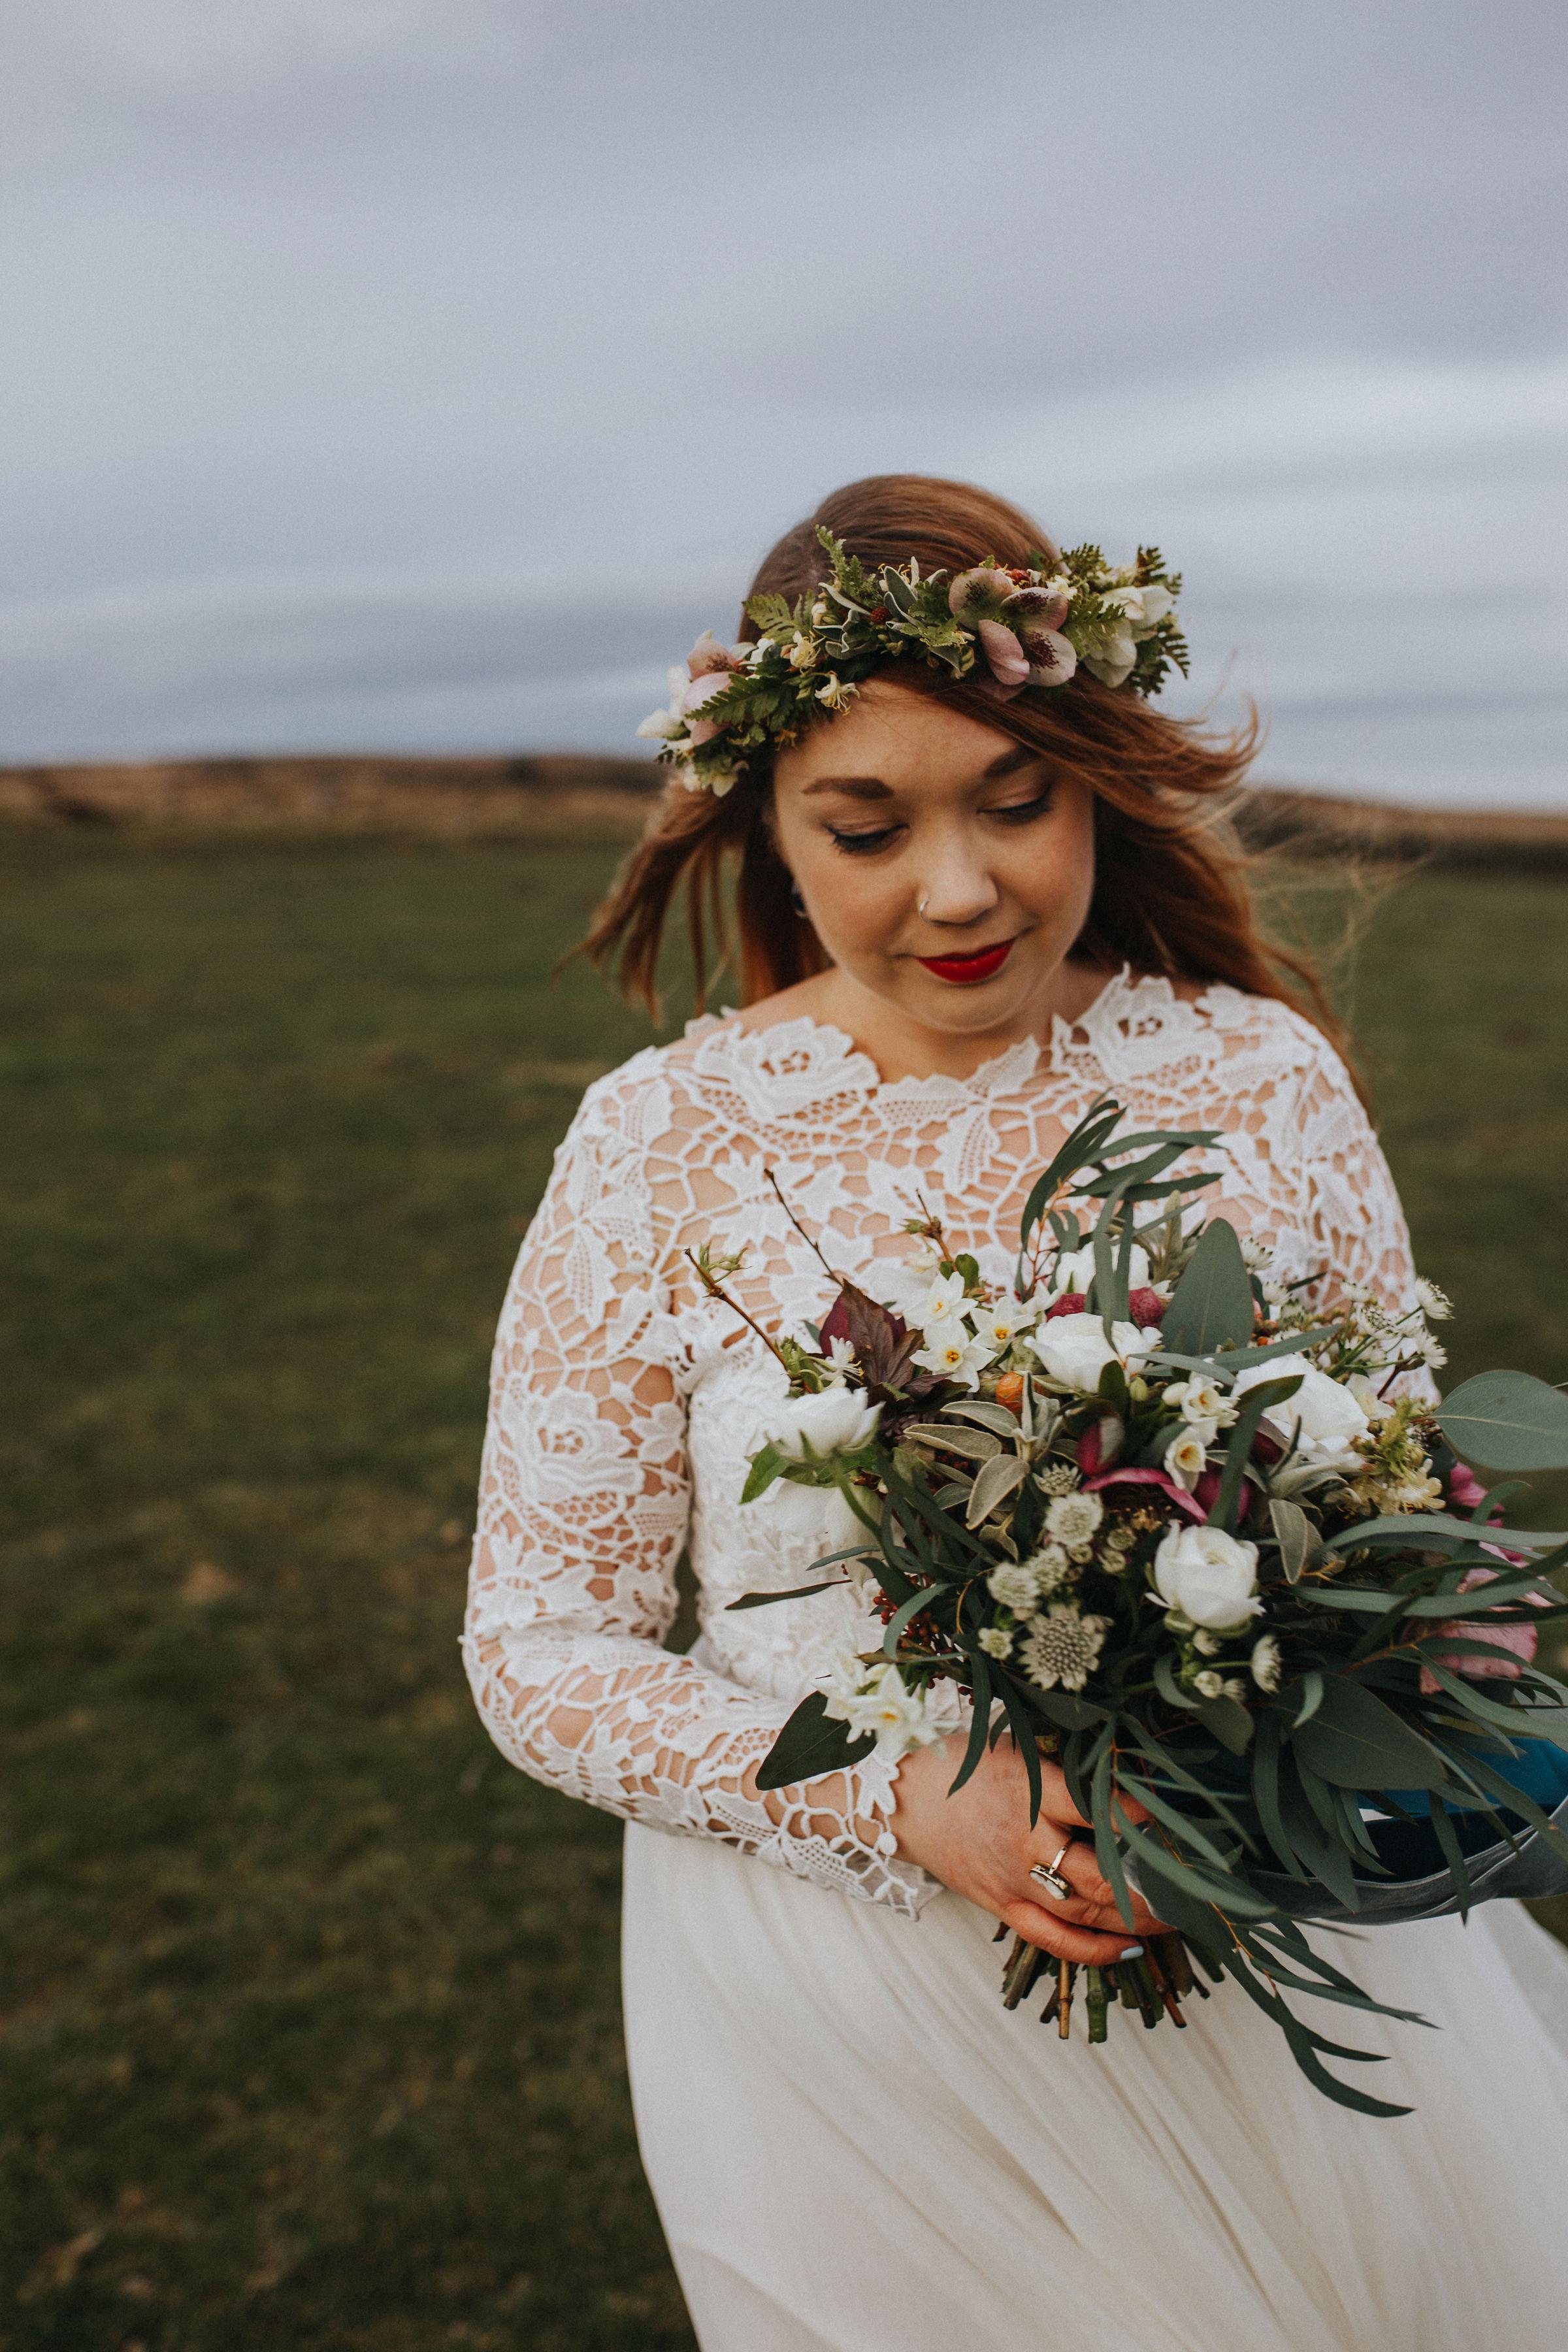 Rosie-bespoke-lace-long sleeved-tulle-wedding-dress-winter-peak district-susanna greening-10.jpg